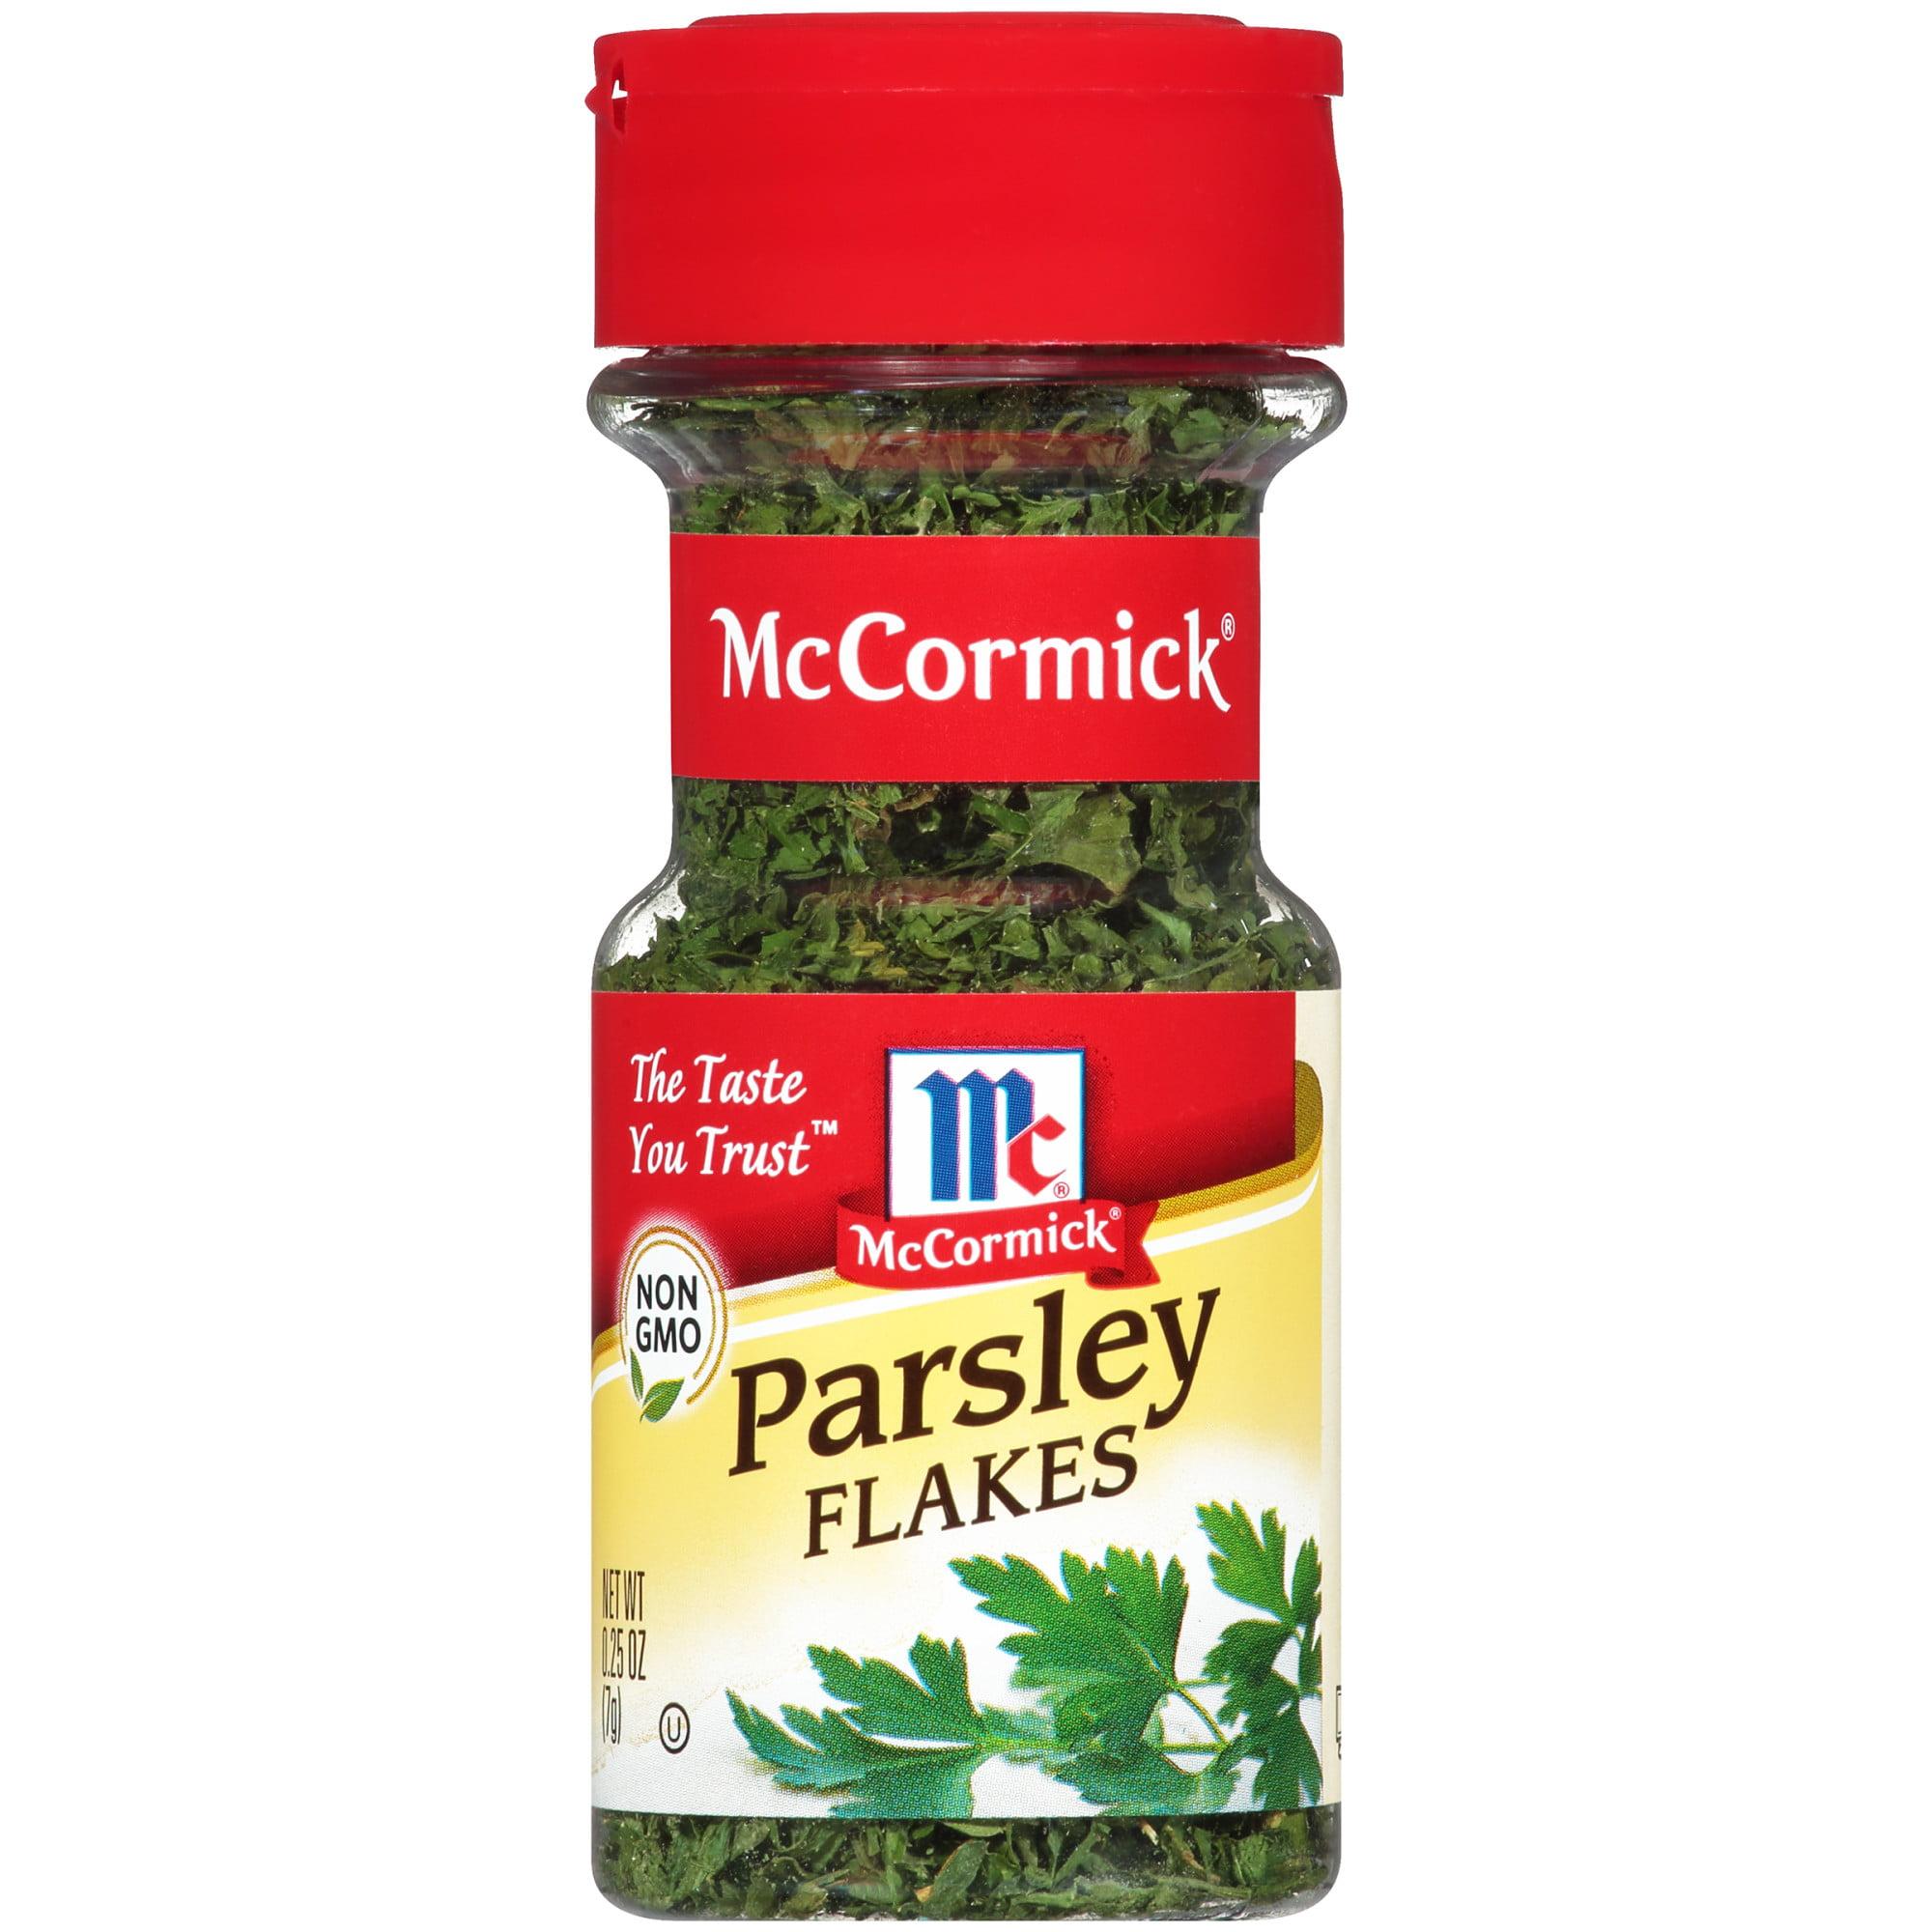 (2 Pack) McCormick Parsley Flakes, 0.25 oz